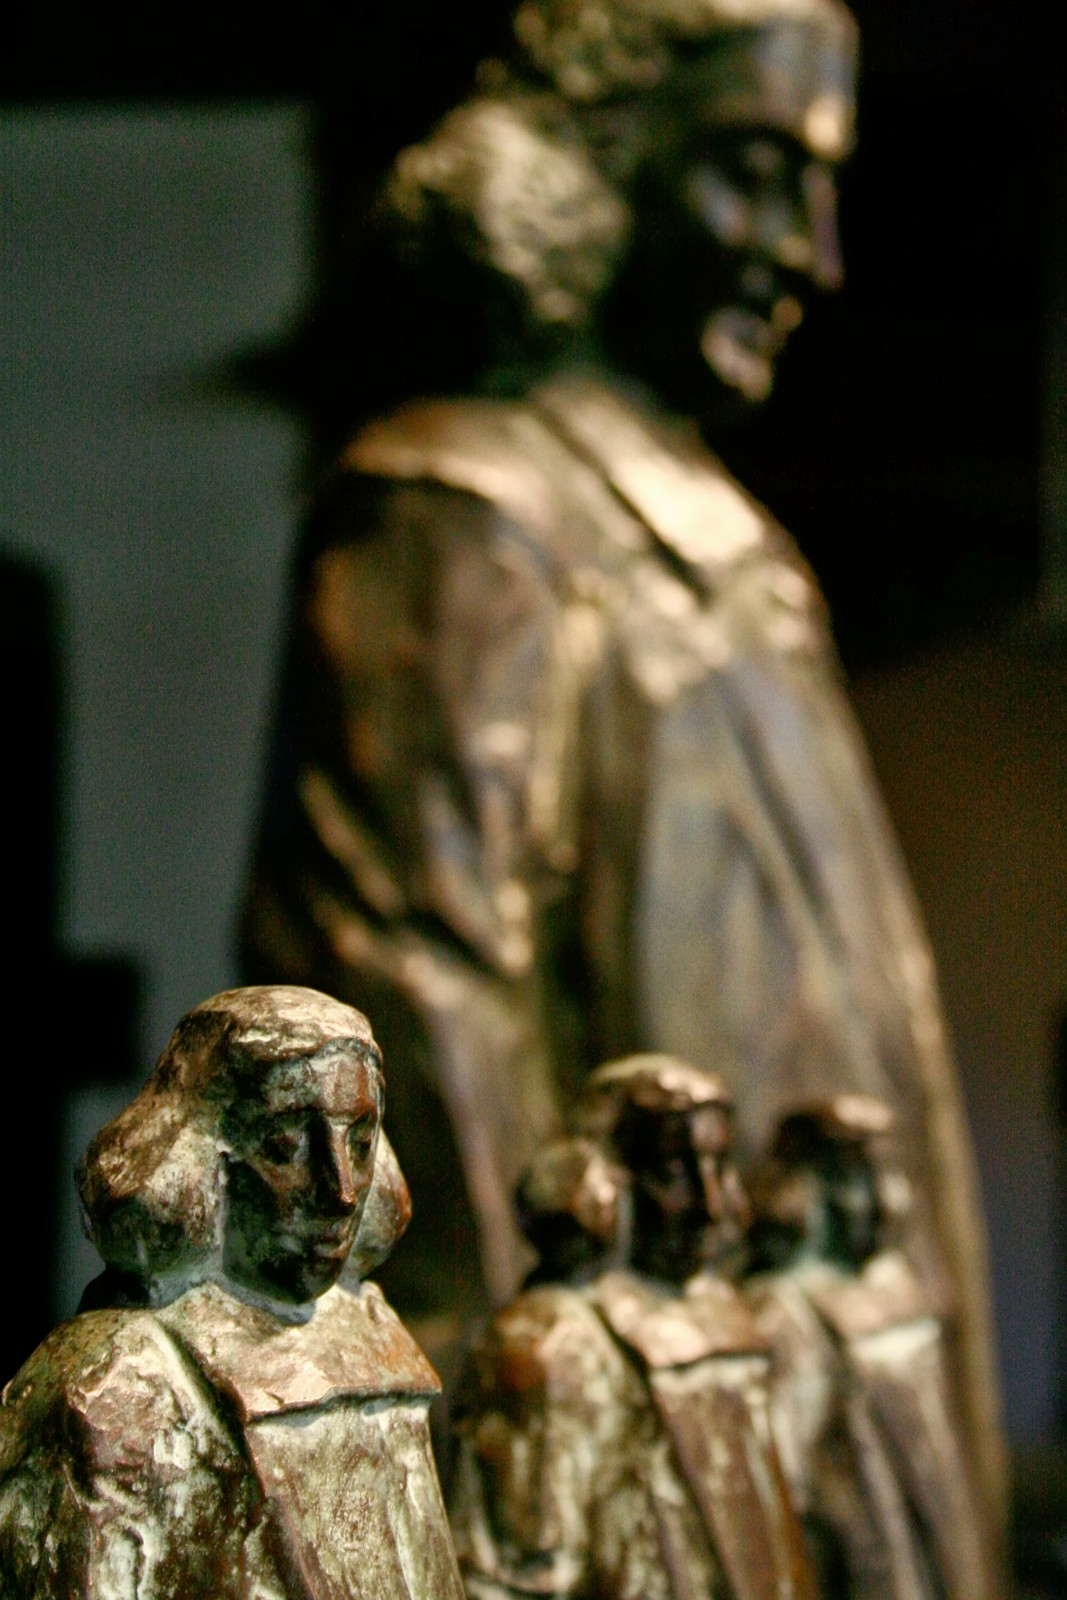 the Spinoza statues